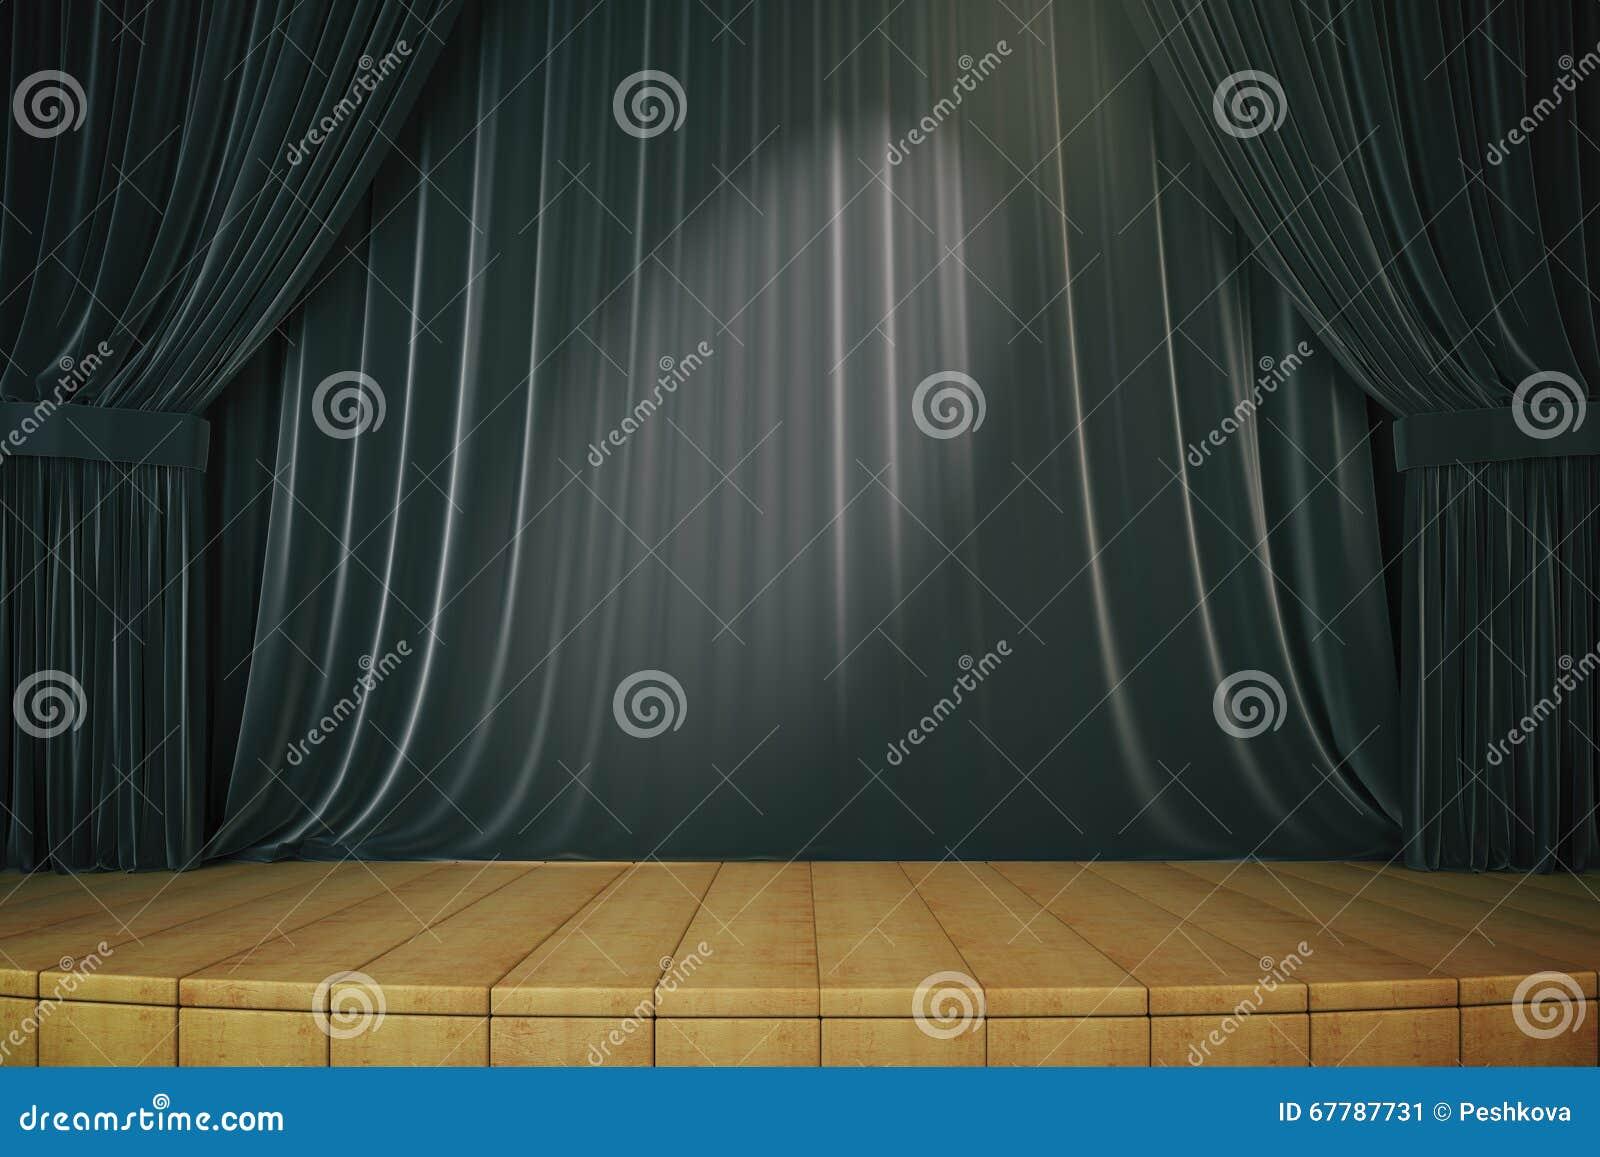 stage floor 3d - photo #15